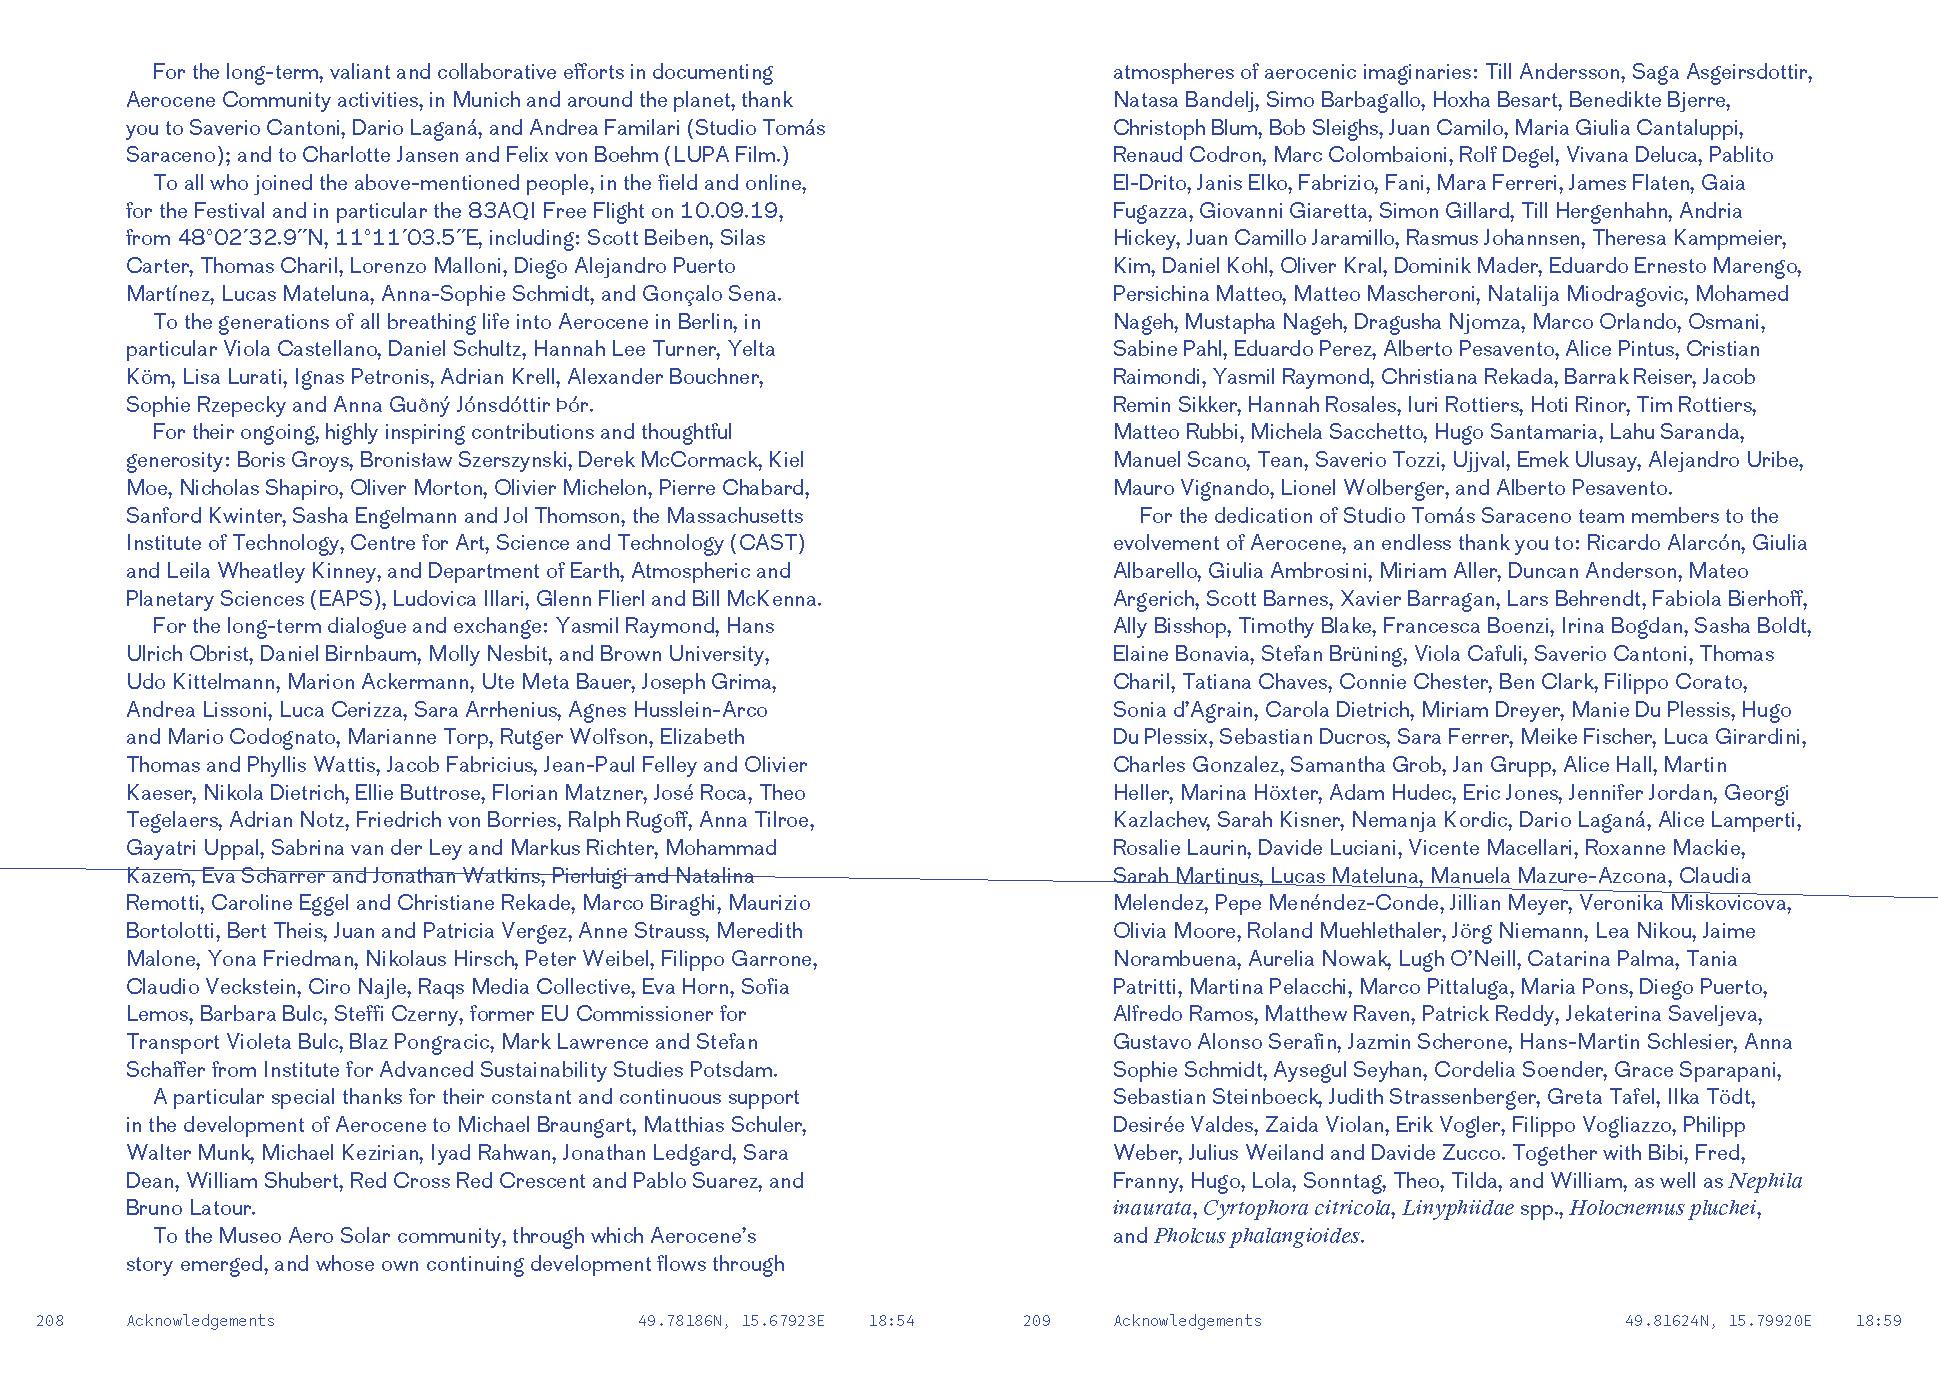 20AE_MovementsfortheAir_Aerocene (1)_Page_105